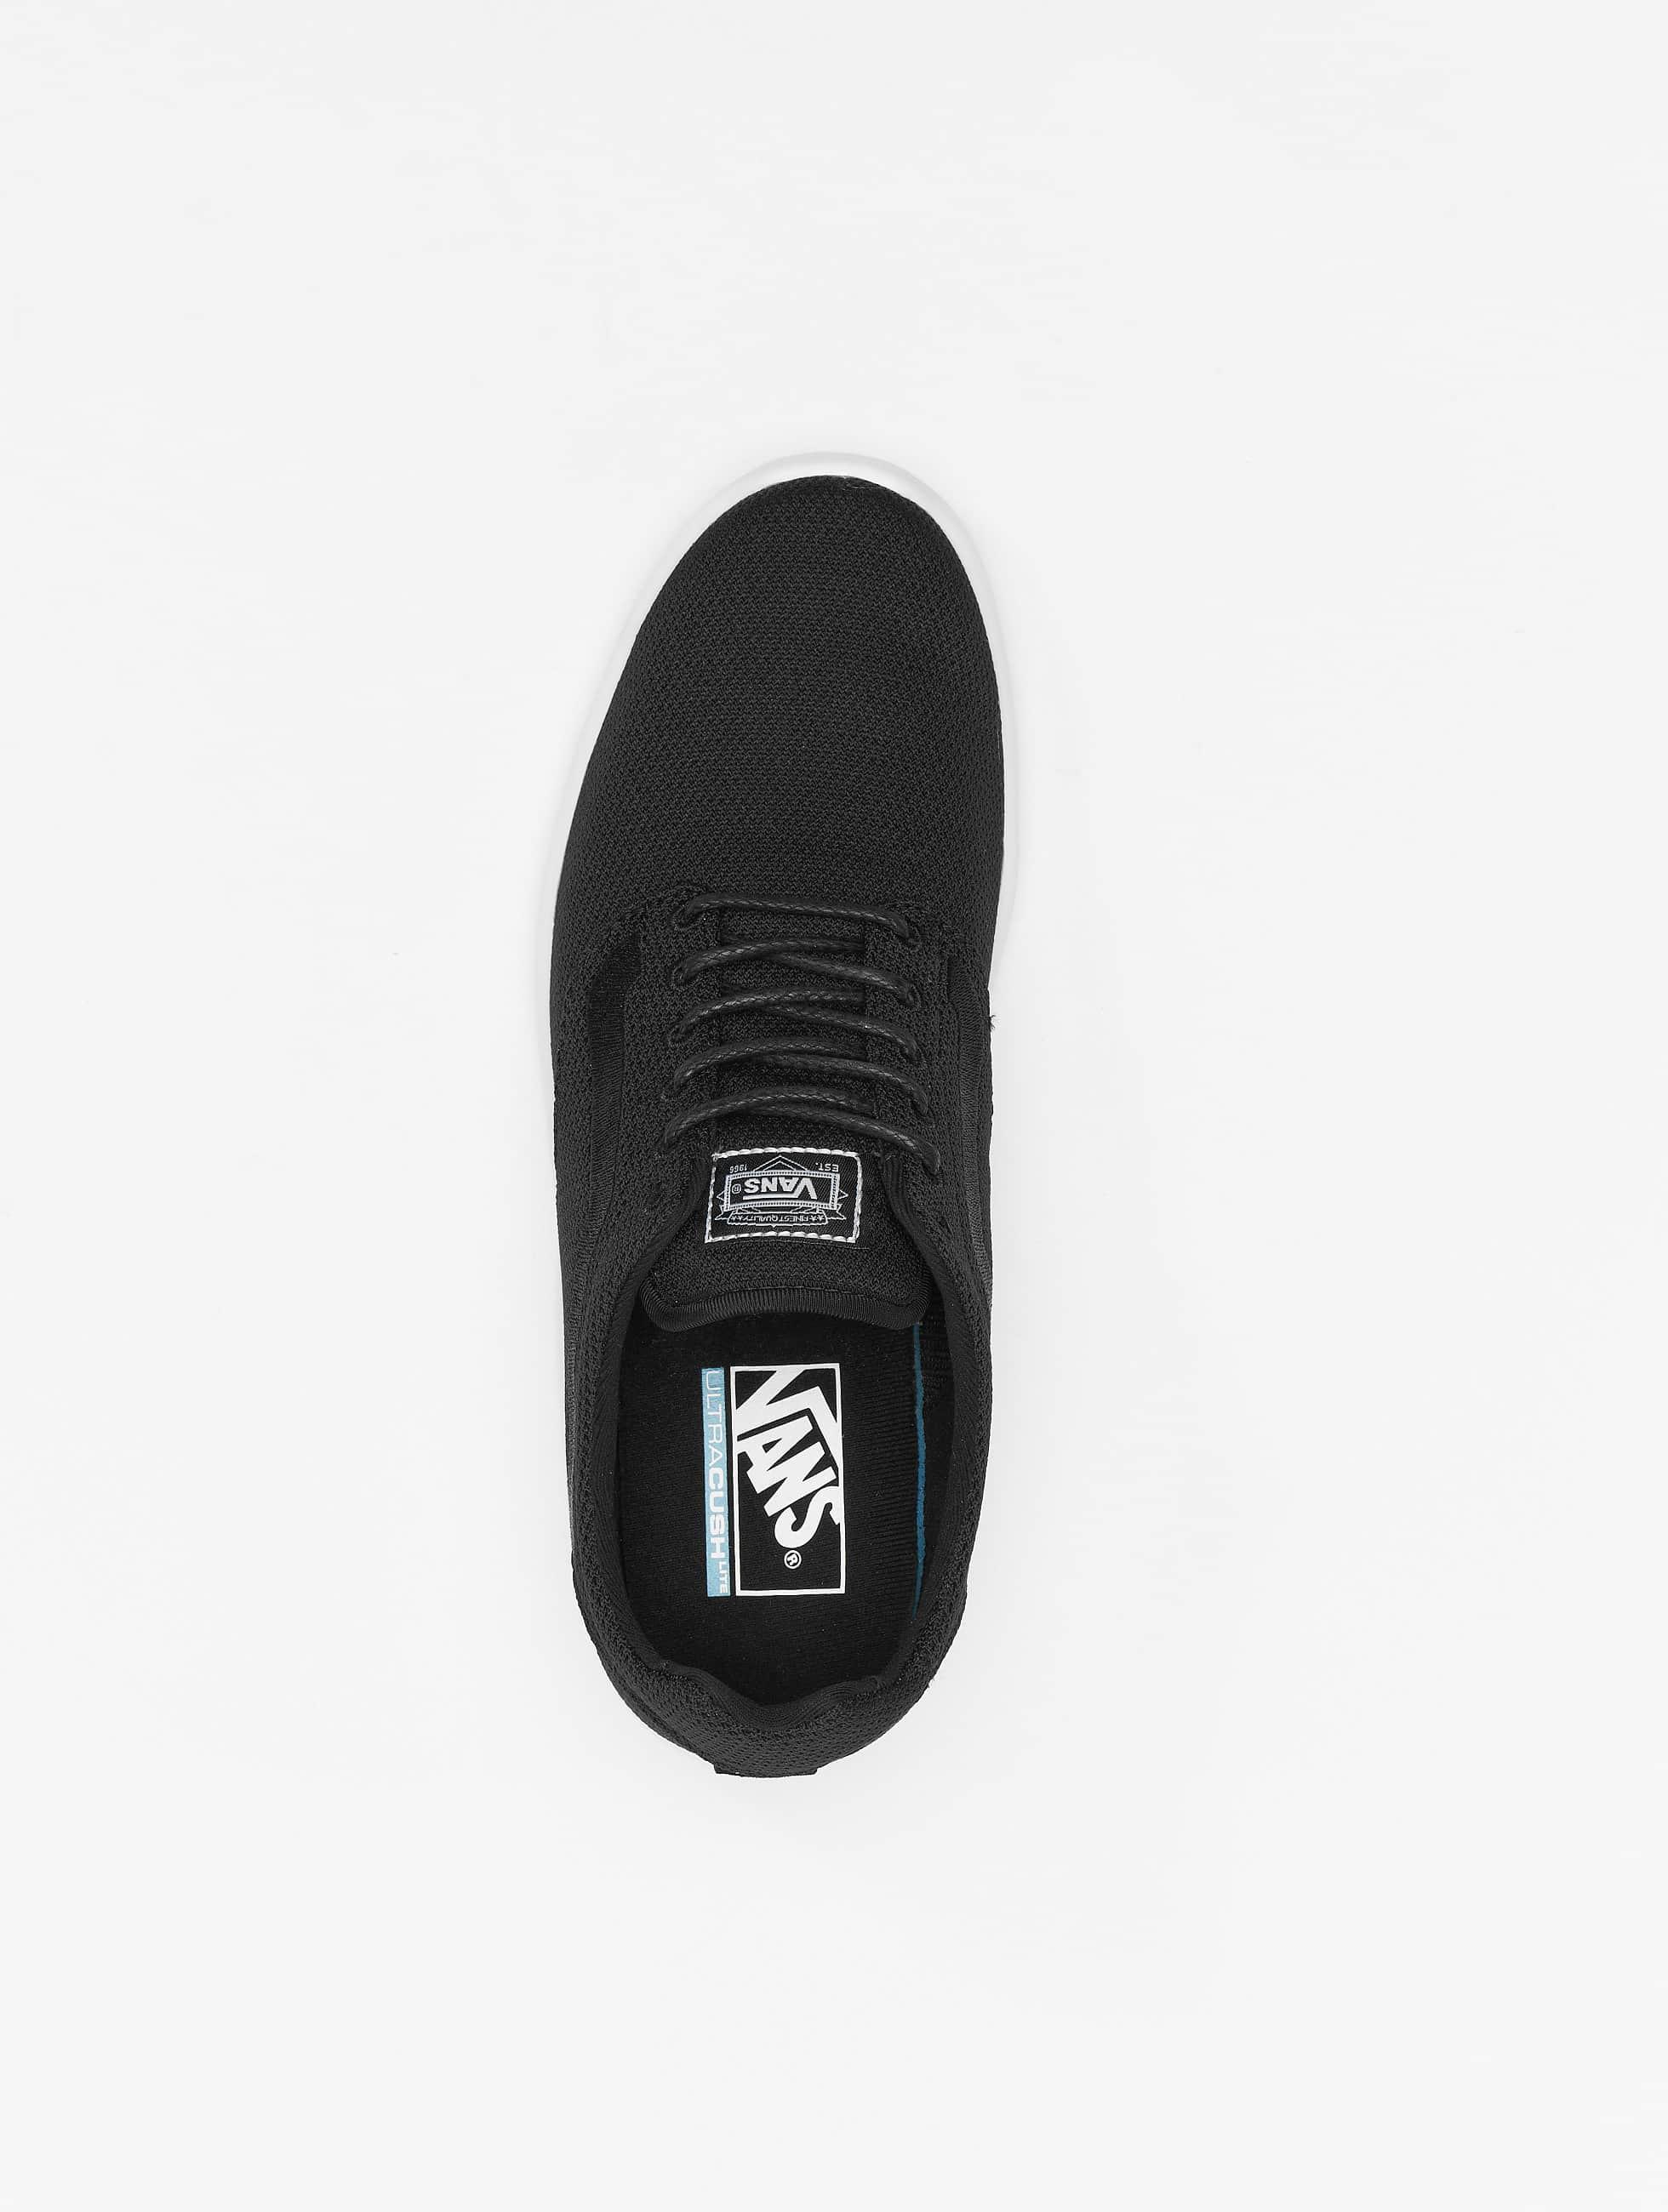 Vans Baskets so 1.5 noir